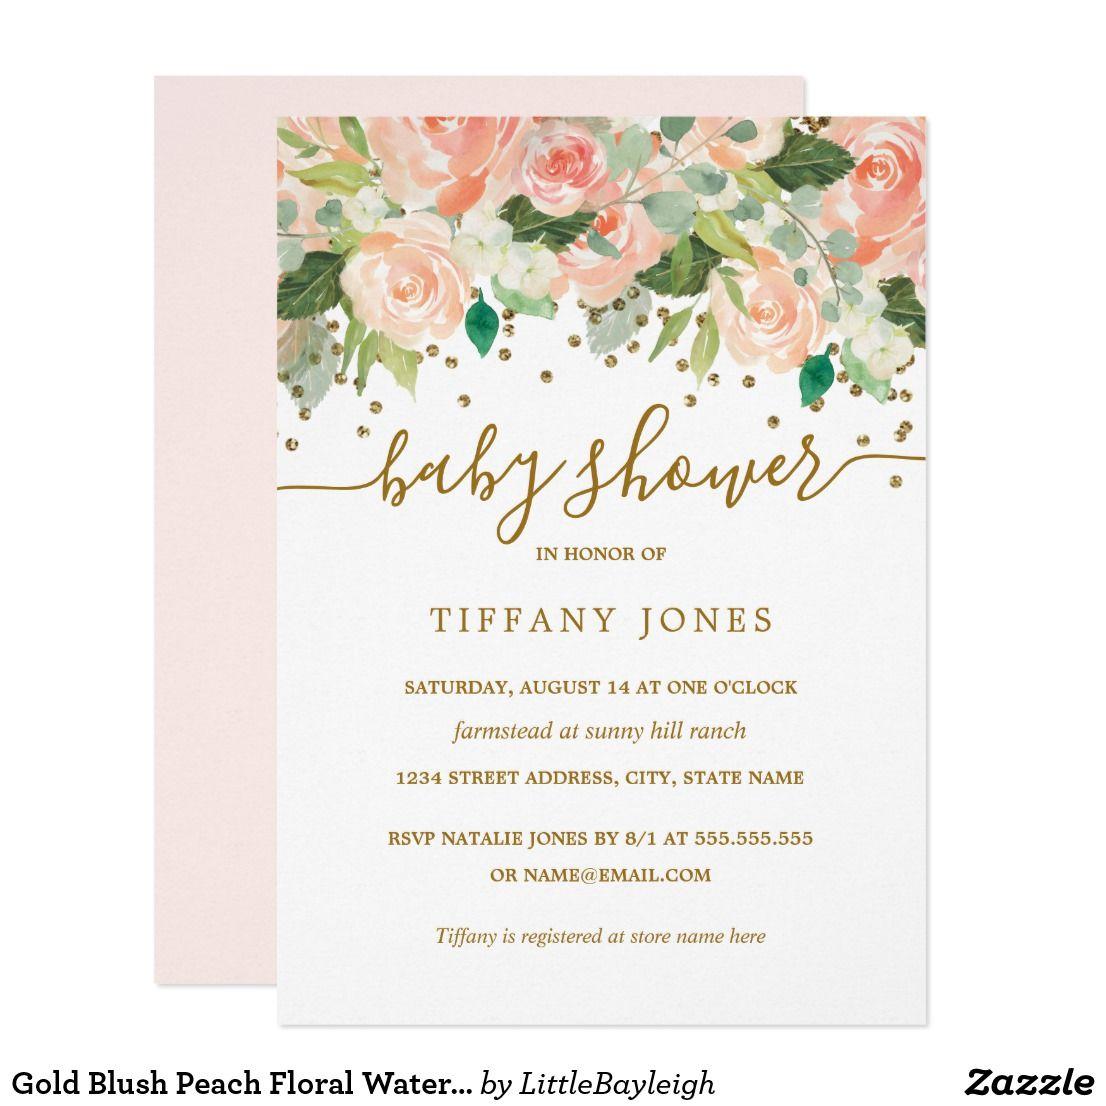 Gold Blush Peach Floral Watercolor Baby Shower Invitation | Zazzle.com |  Watercolor bridal shower invitations, Floral baby shower invitations,  Watercolor baby shower invitations